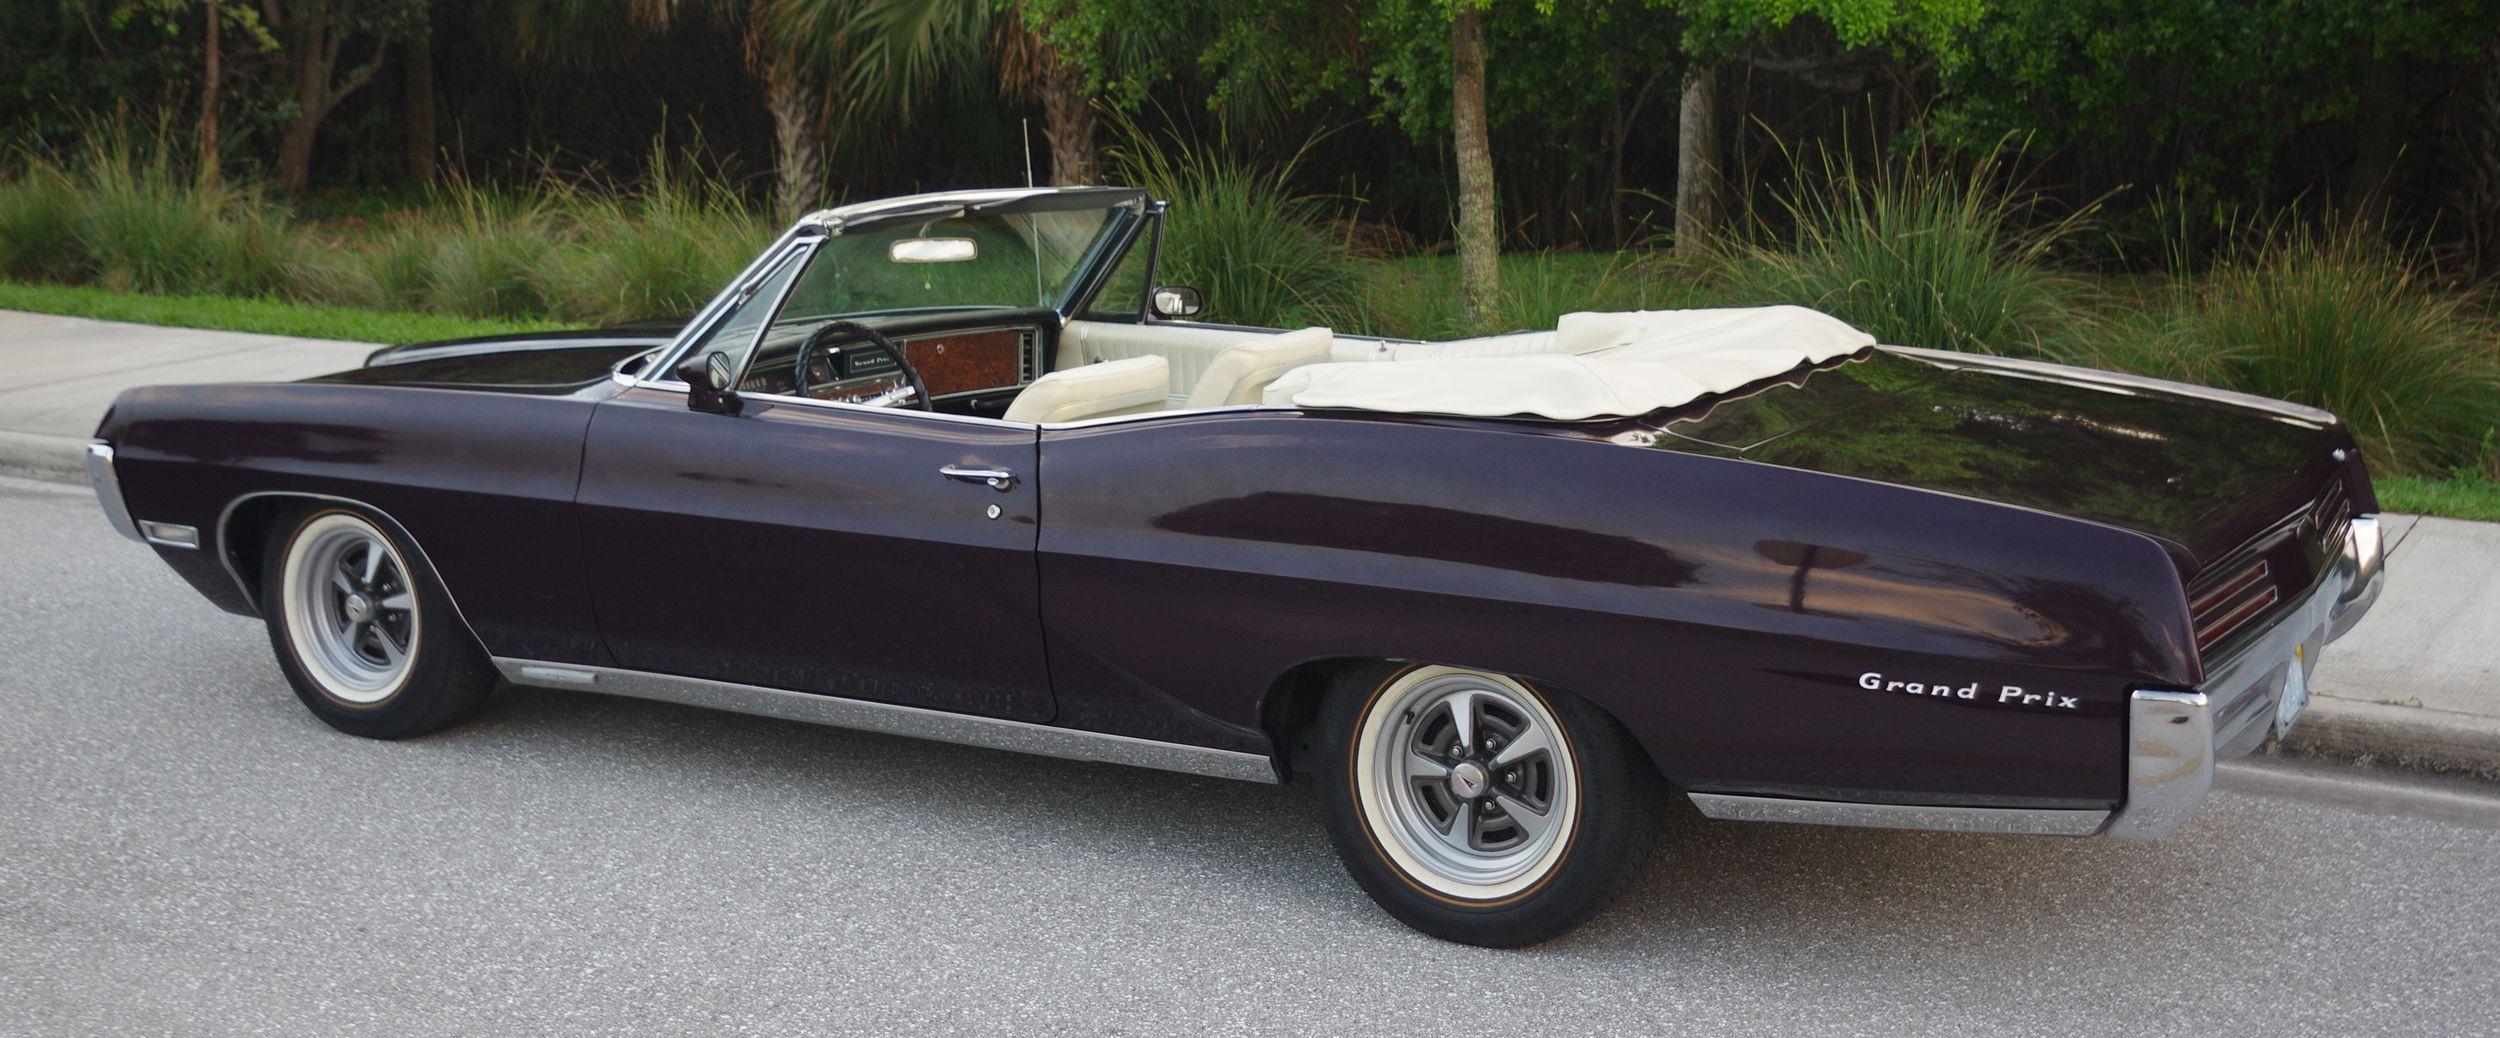 1967 pontiac grand prix convertible